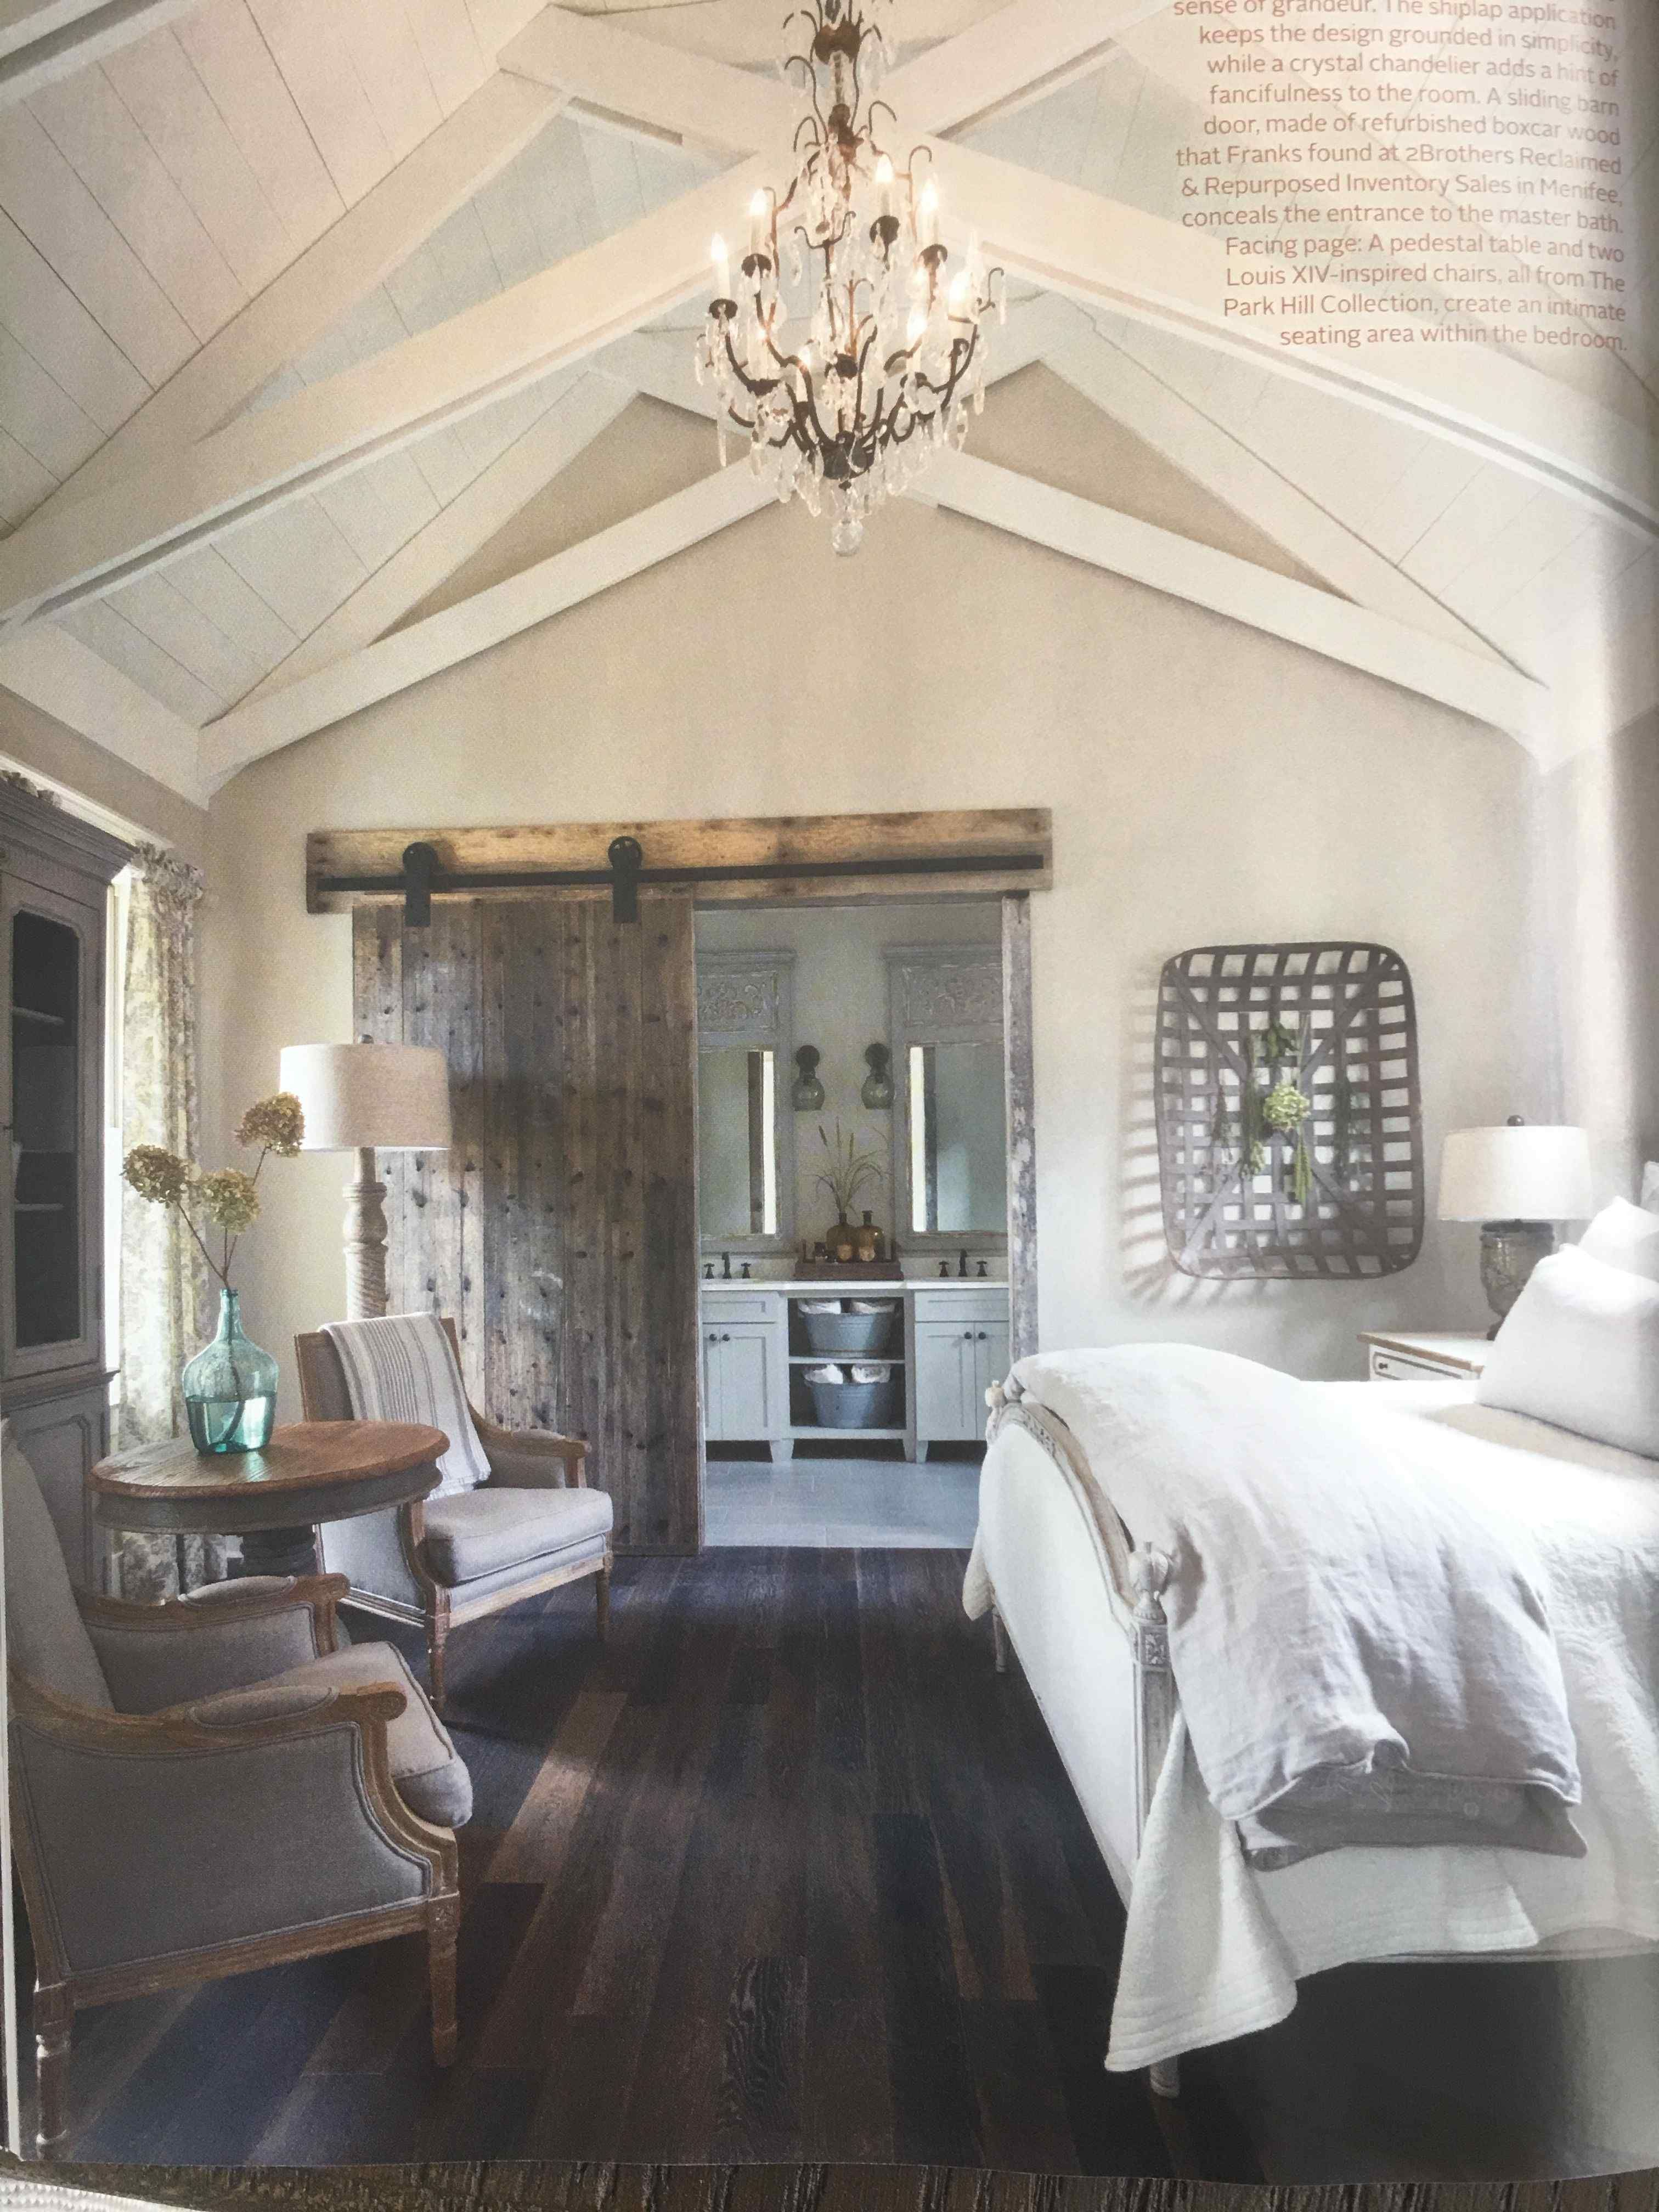 56 The Benefits Of Affordable Coastal Master Bedroom